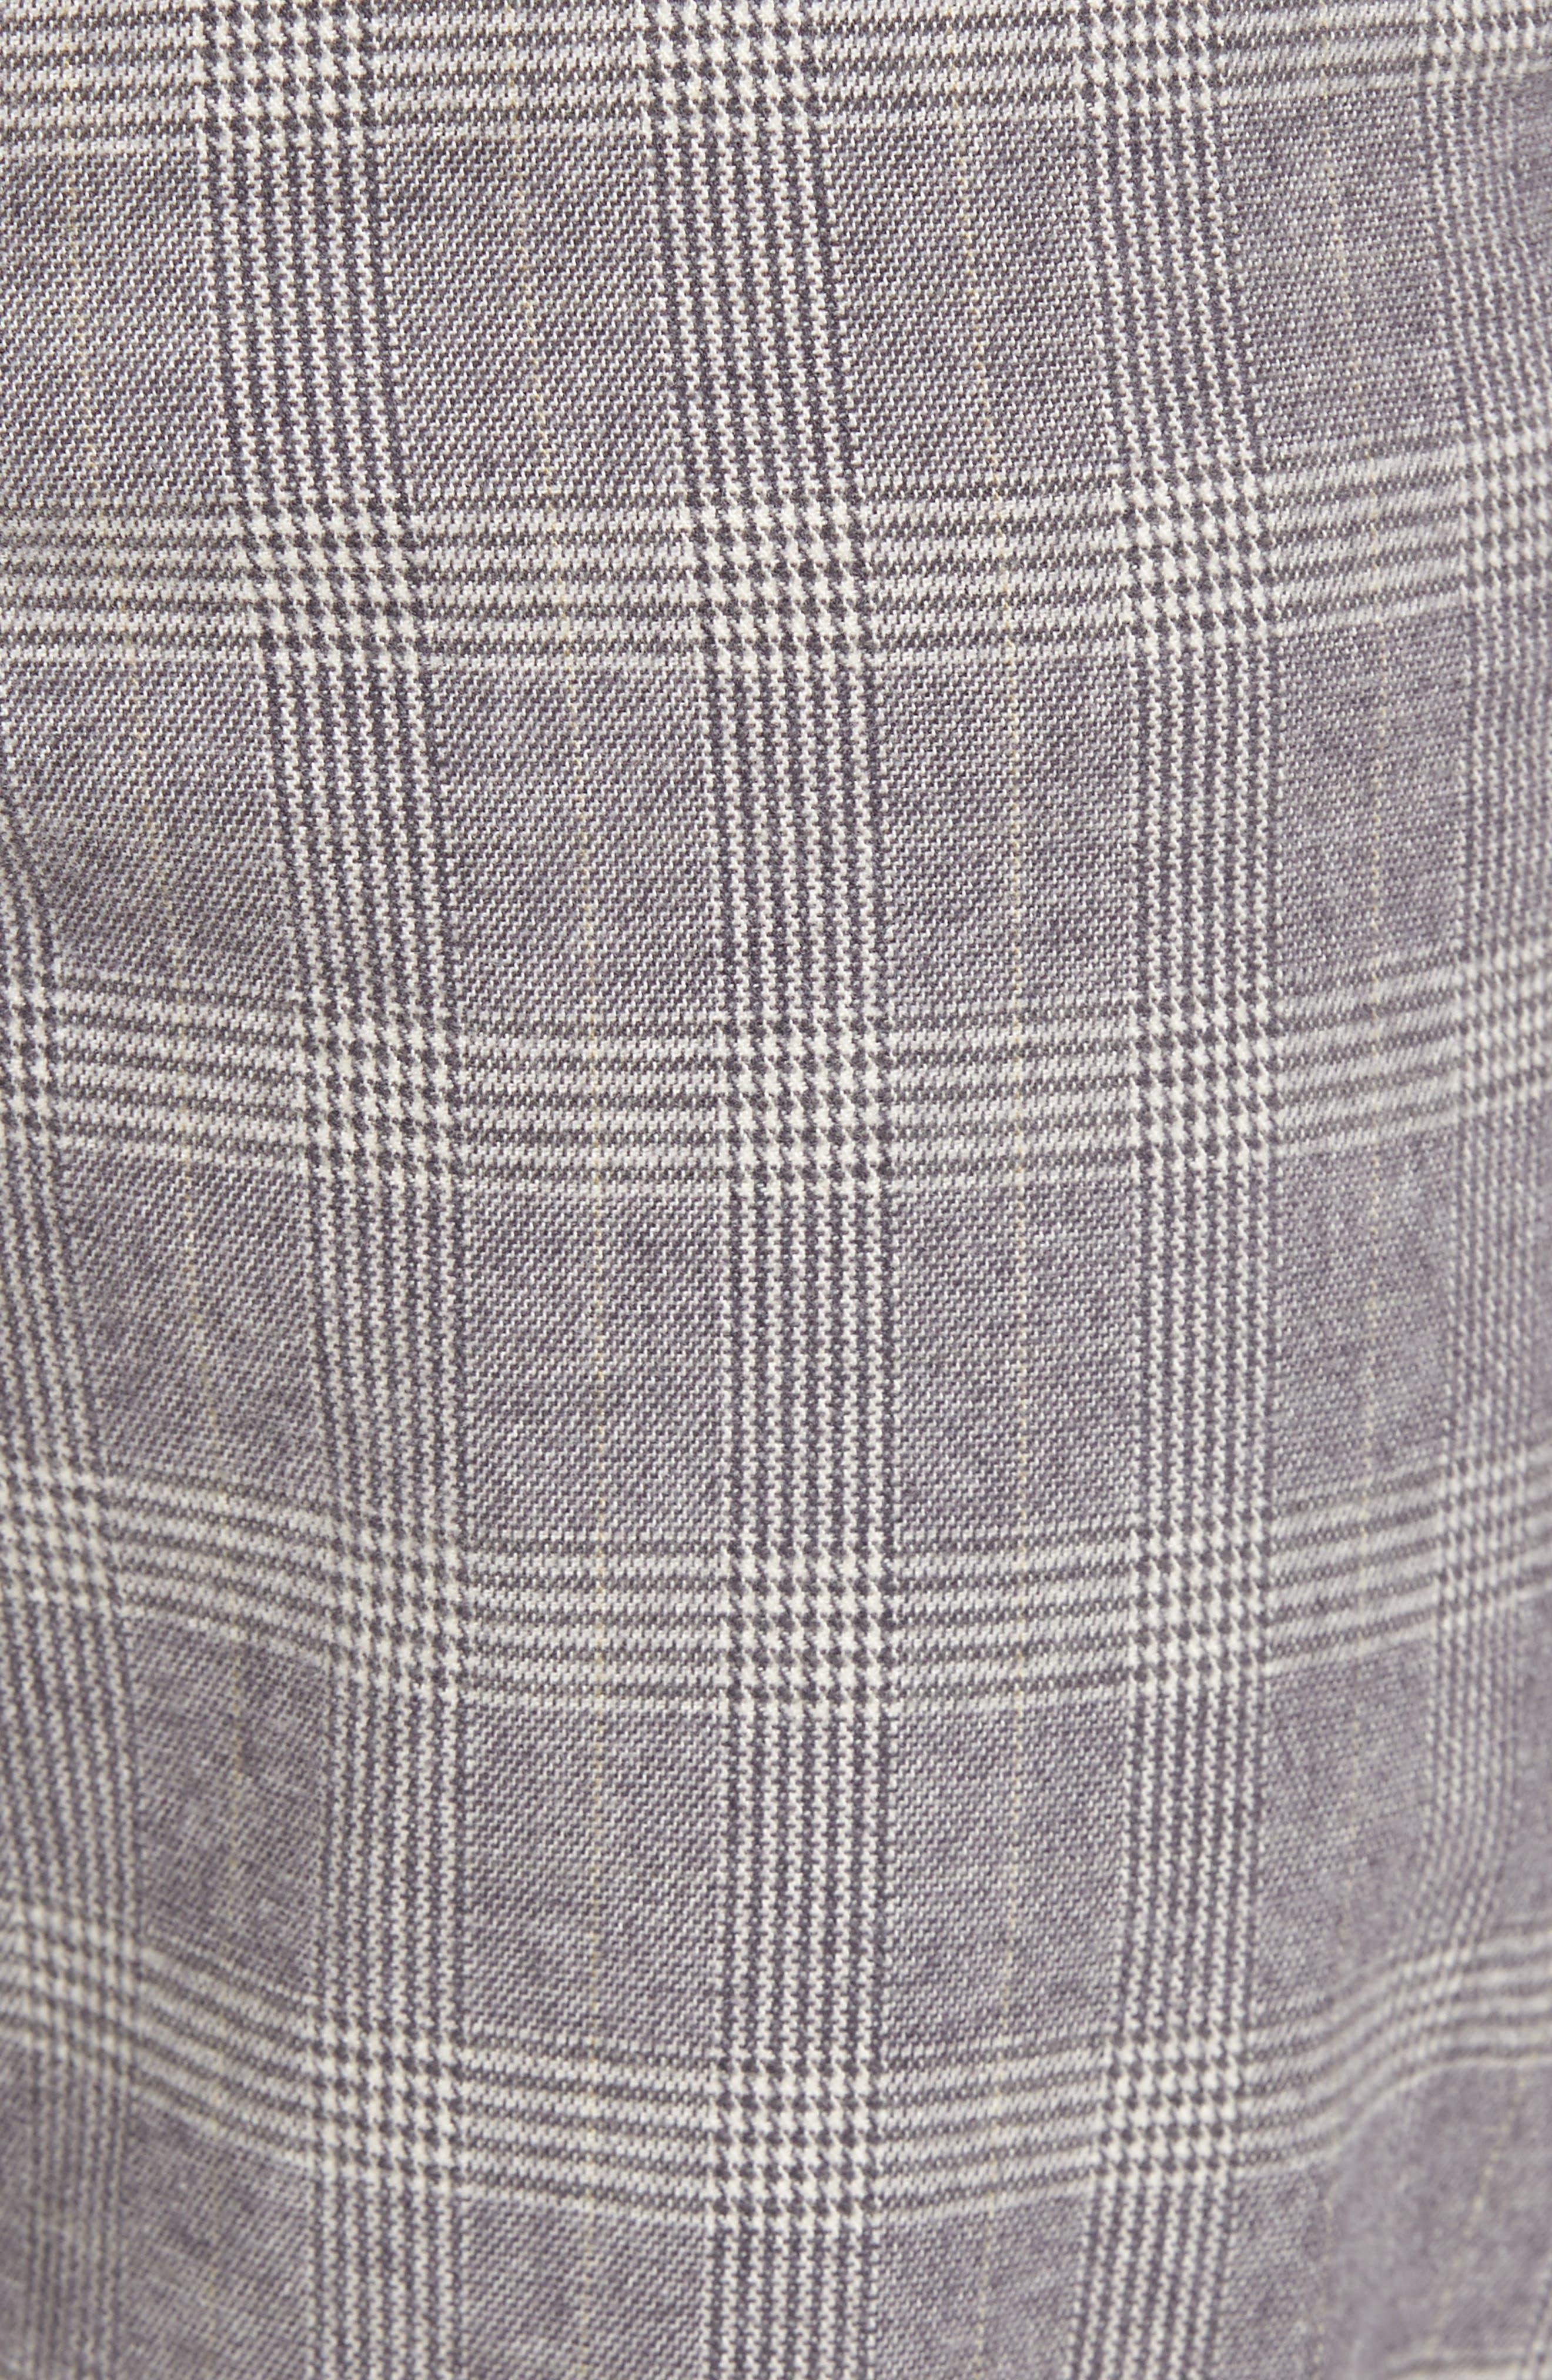 Marshall Slim Fit Pants,                             Alternate thumbnail 5, color,                             250